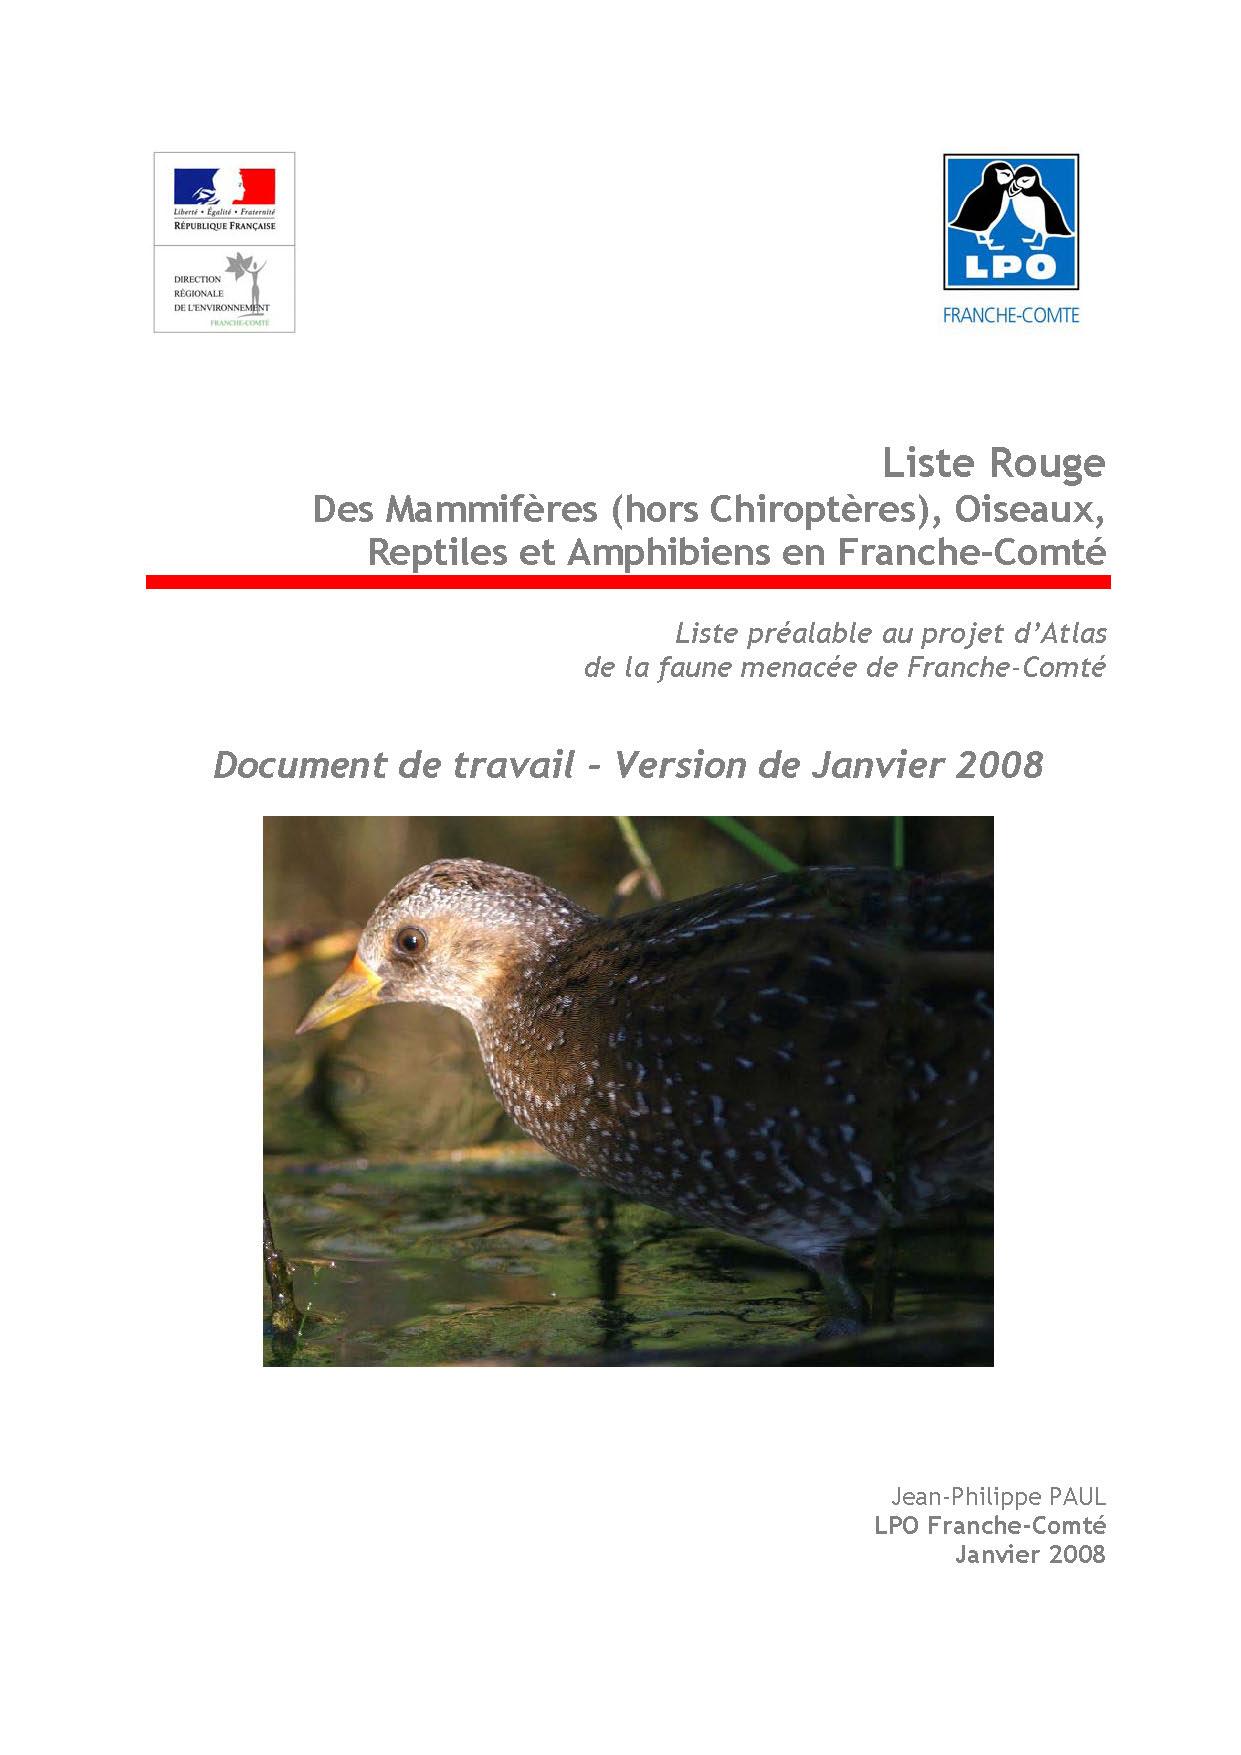 https://cdnfiles1.biolovision.net/franche-comte.lpo.fr/userfiles/proteger/Protectionespces/Liste-rouge-vertebres-terrestres-Franche-Comte-Jan-2008.pdf